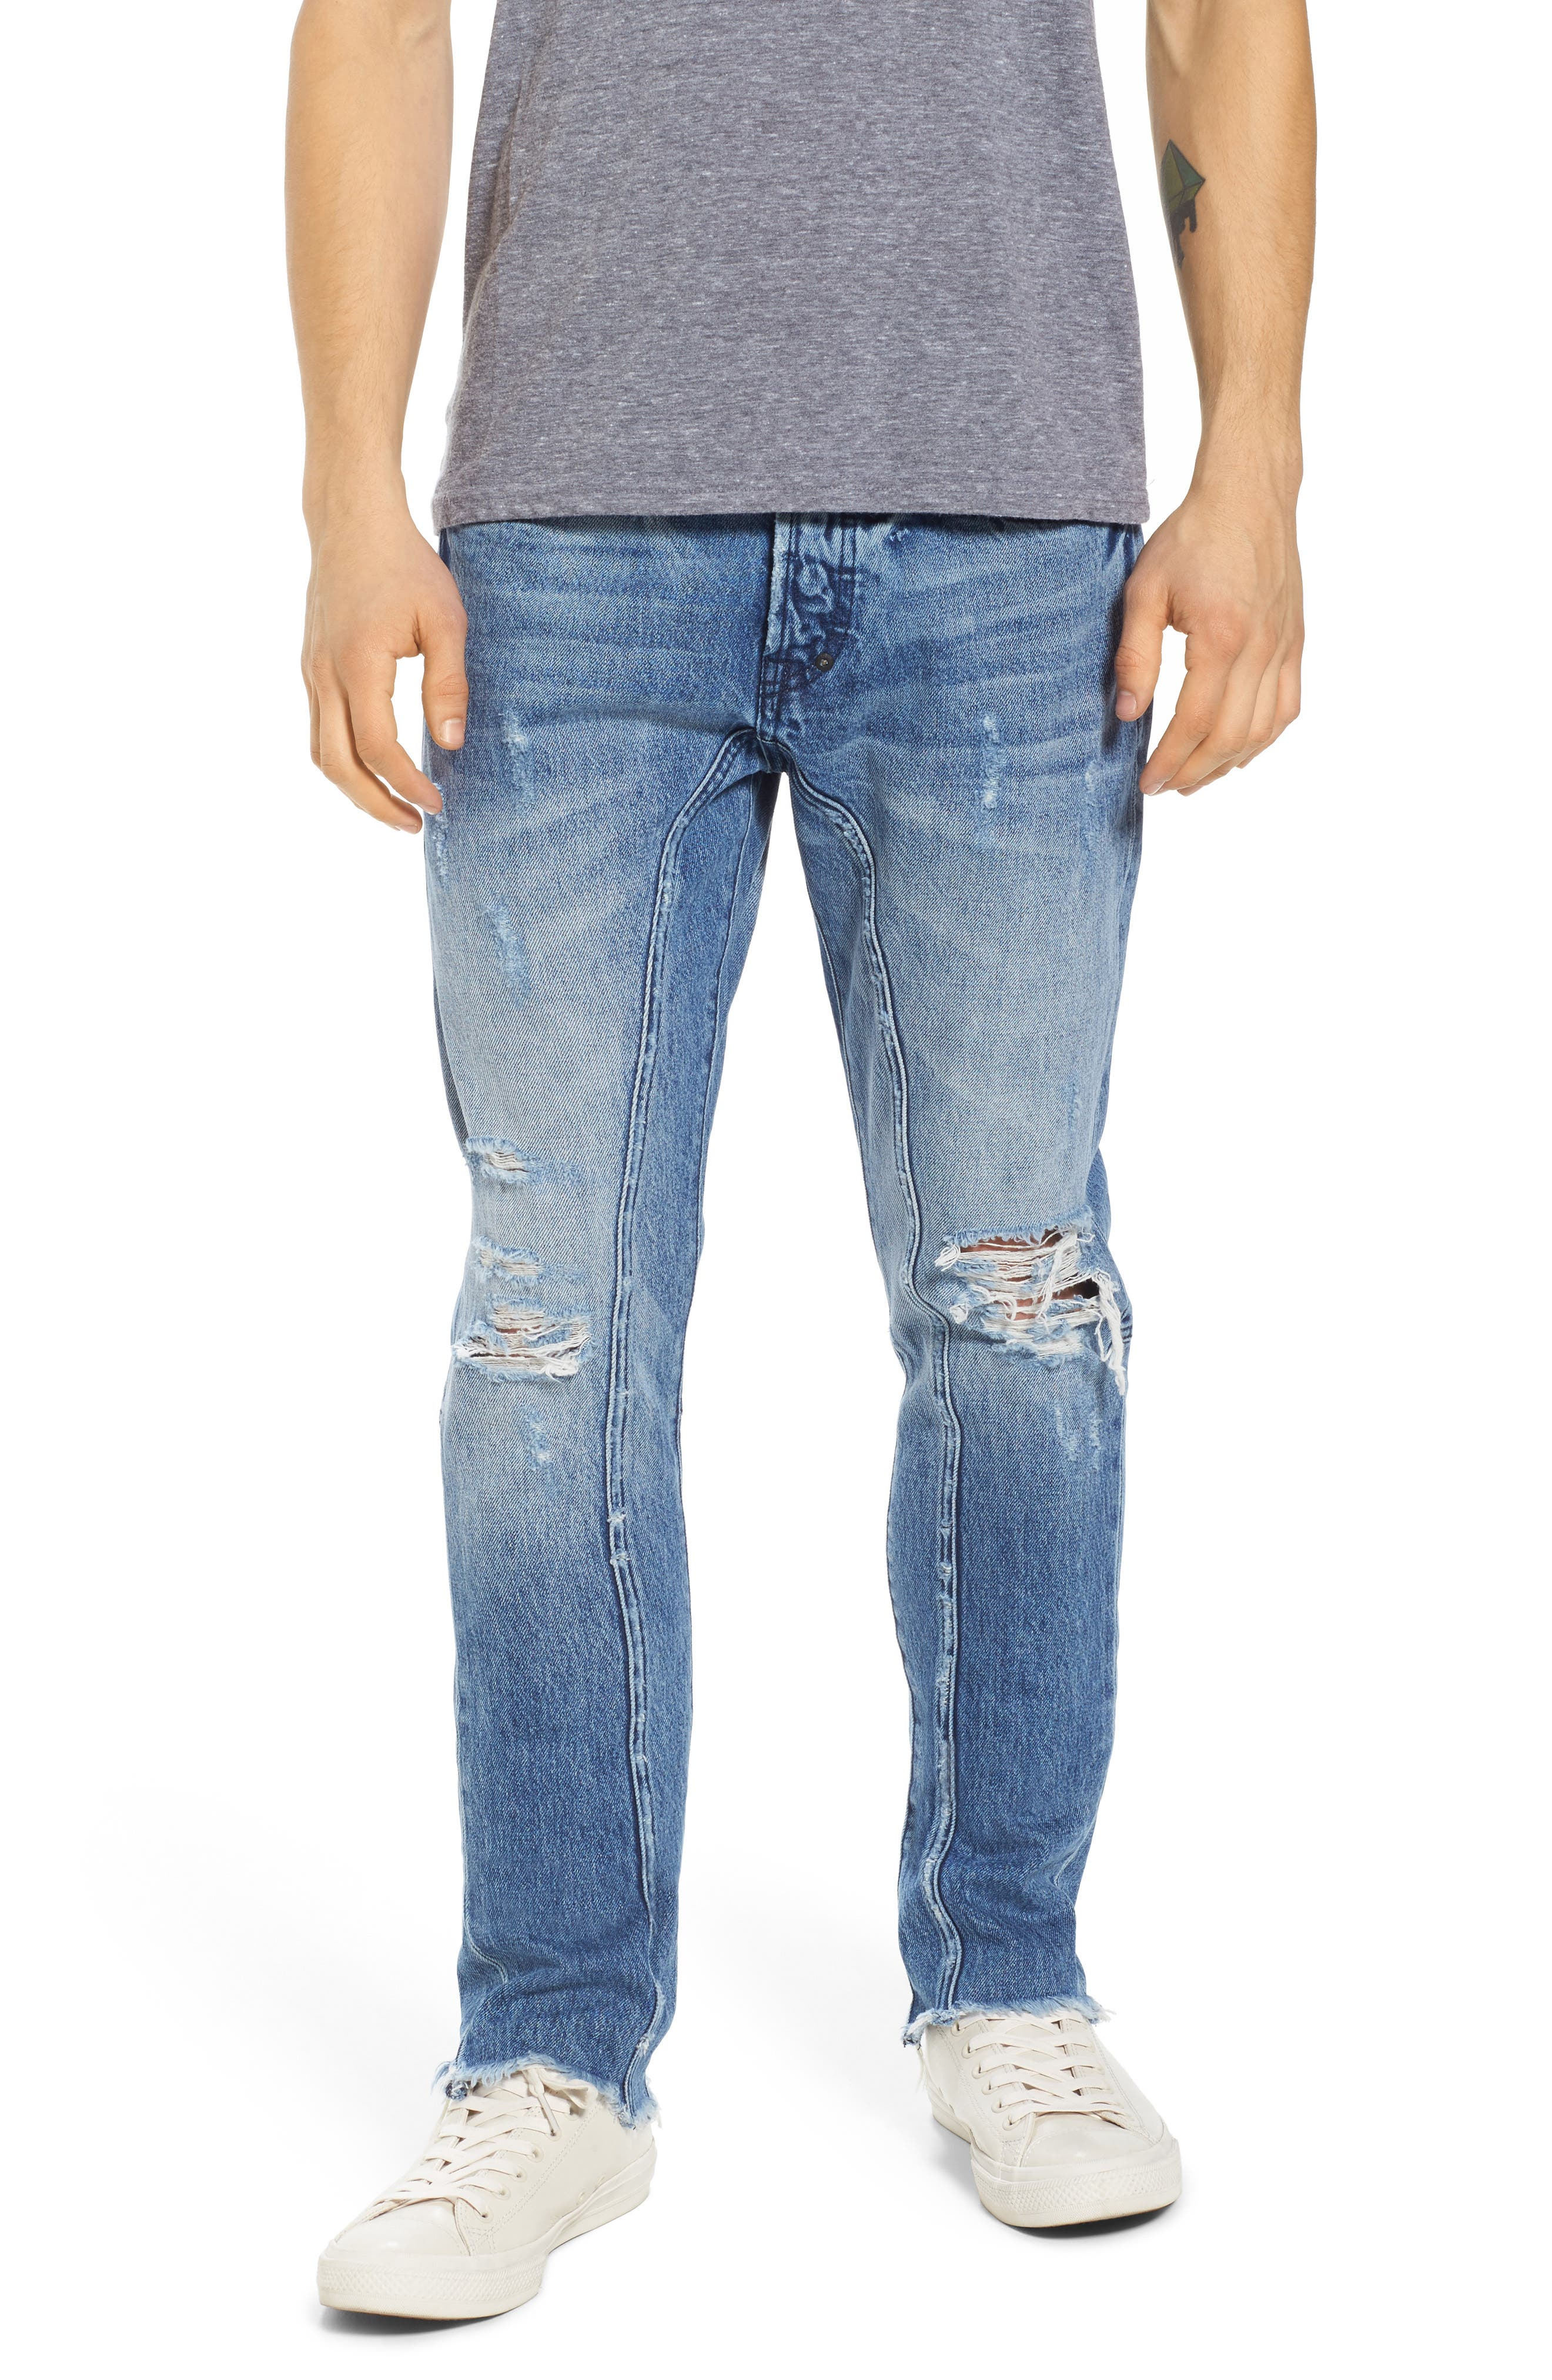 Le Sabre Tapered Fit Jeans,                         Main,                         color, Ischium